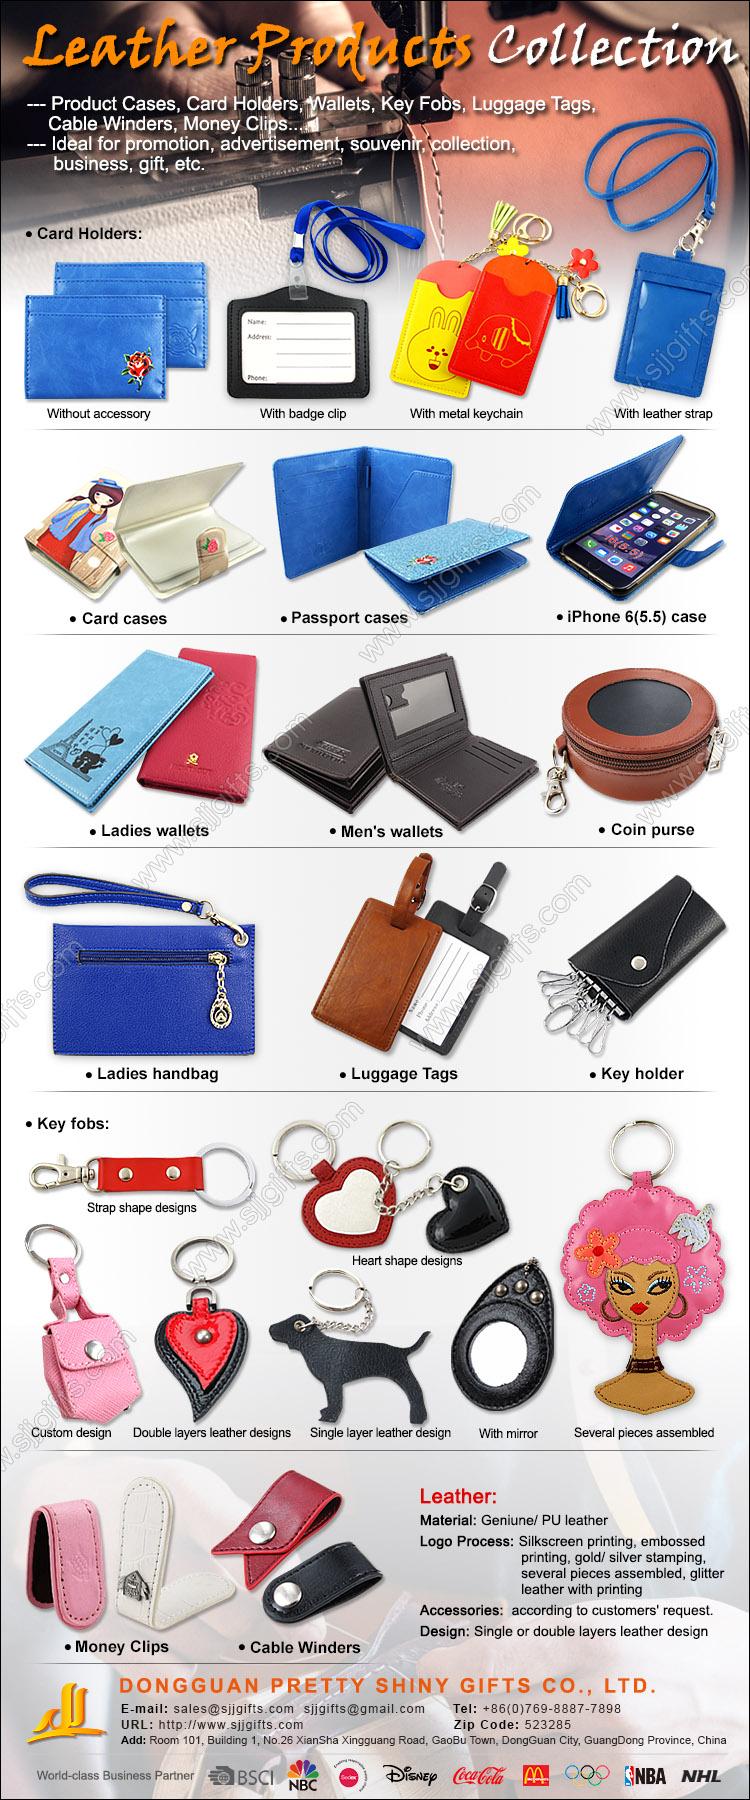 leather made souvenir items